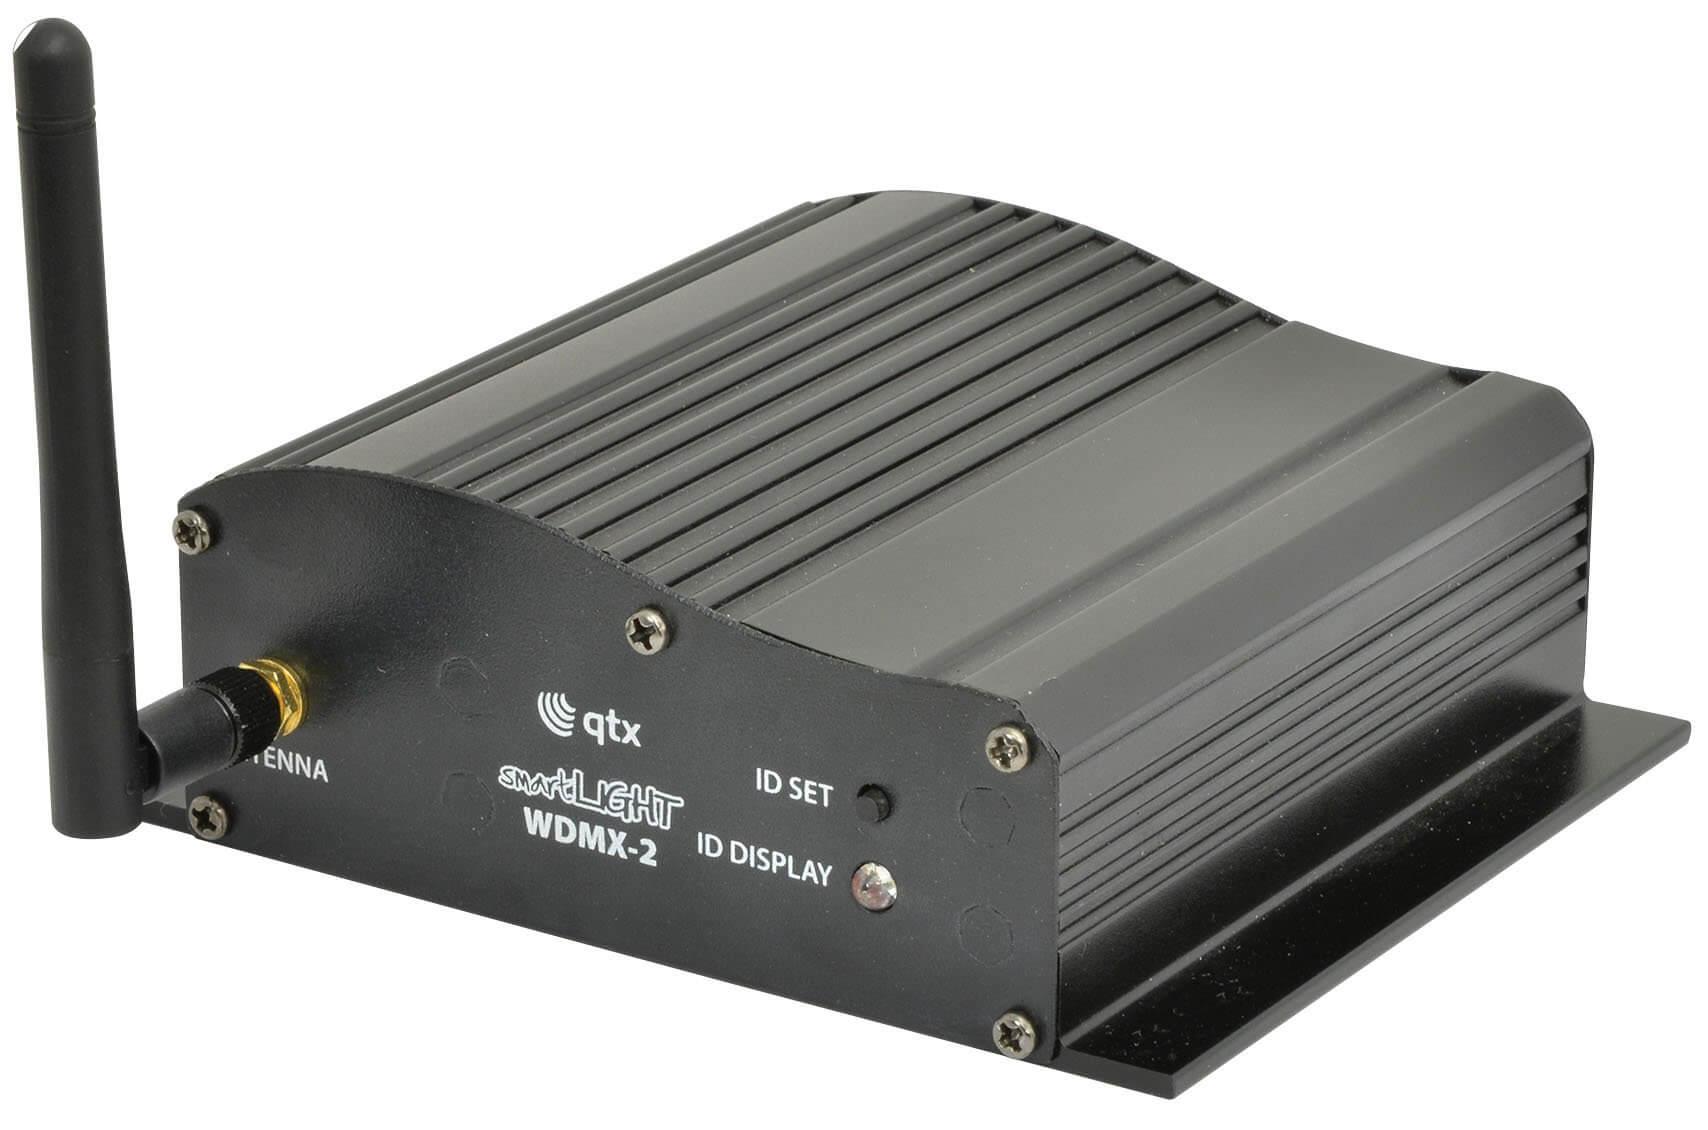 QTX Wireless DMX WDMX-2 Transceiver Lighting